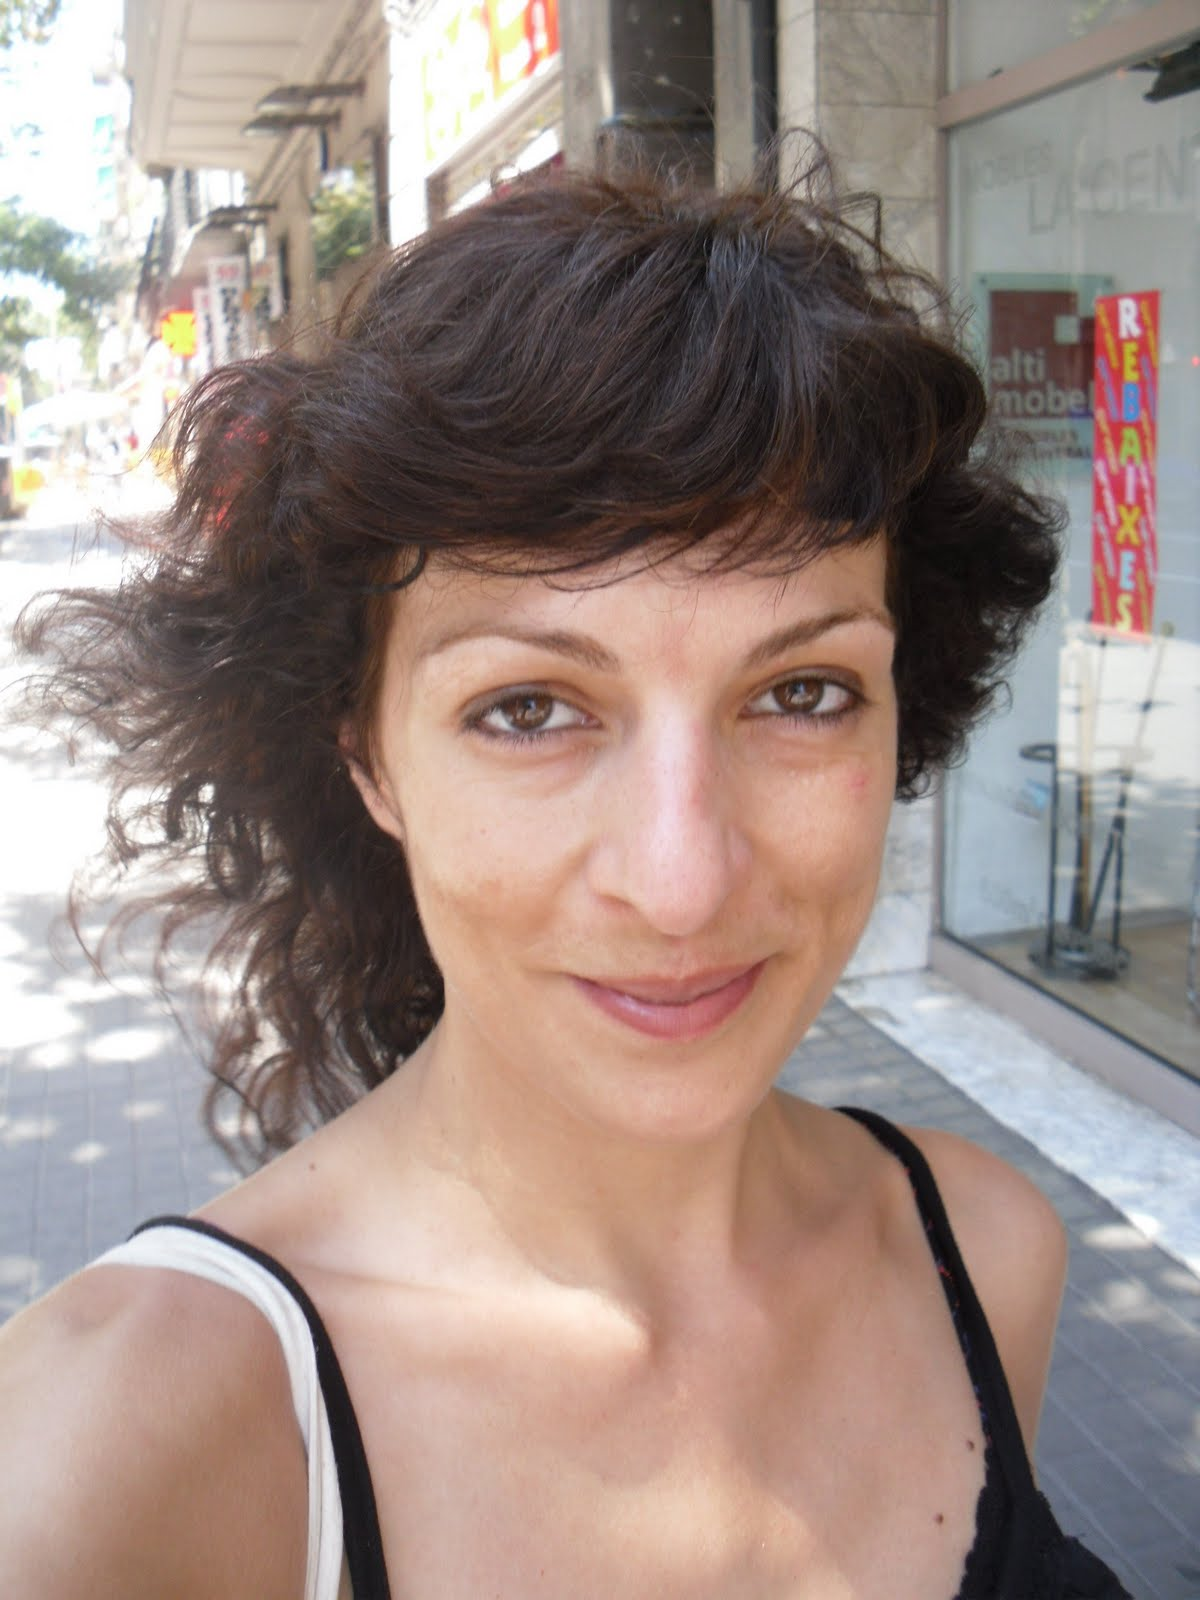 Amaranta Ruiz Culo poetas siglo xxi - antologia mundial + 20.000 poetas: editor